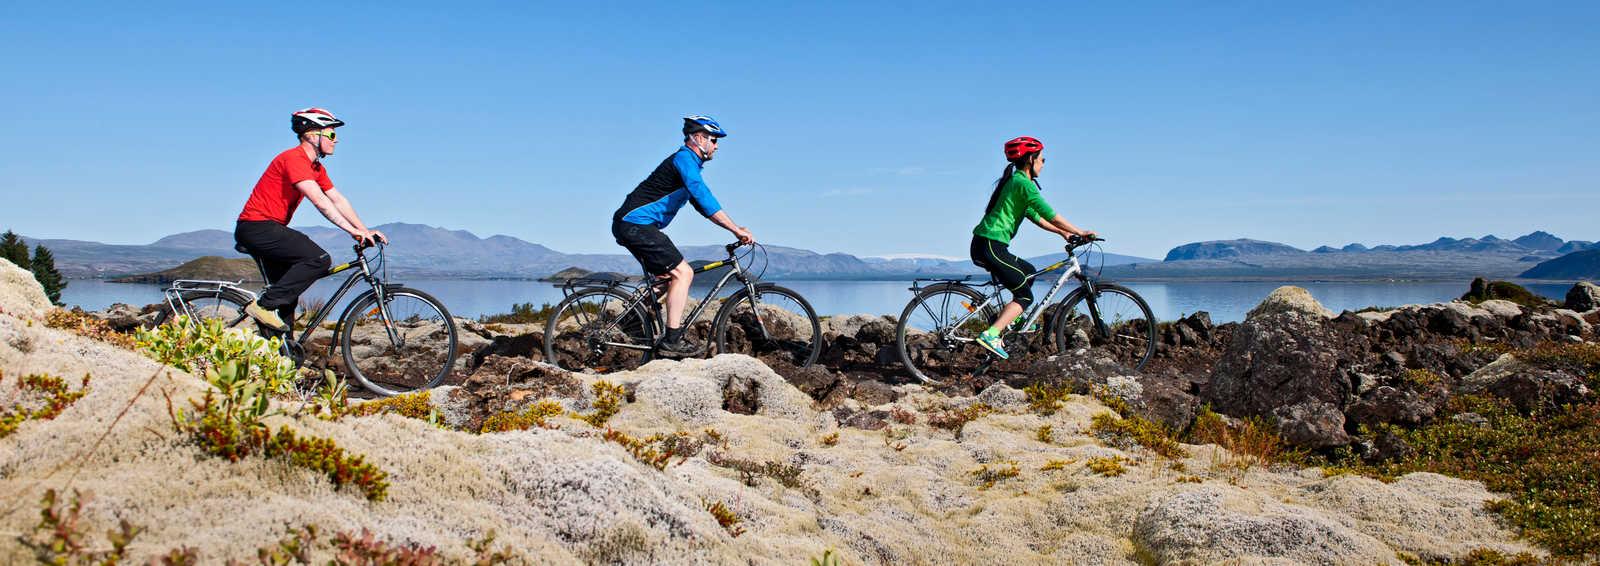 Cycling near Nesjavellir, southern Iceland